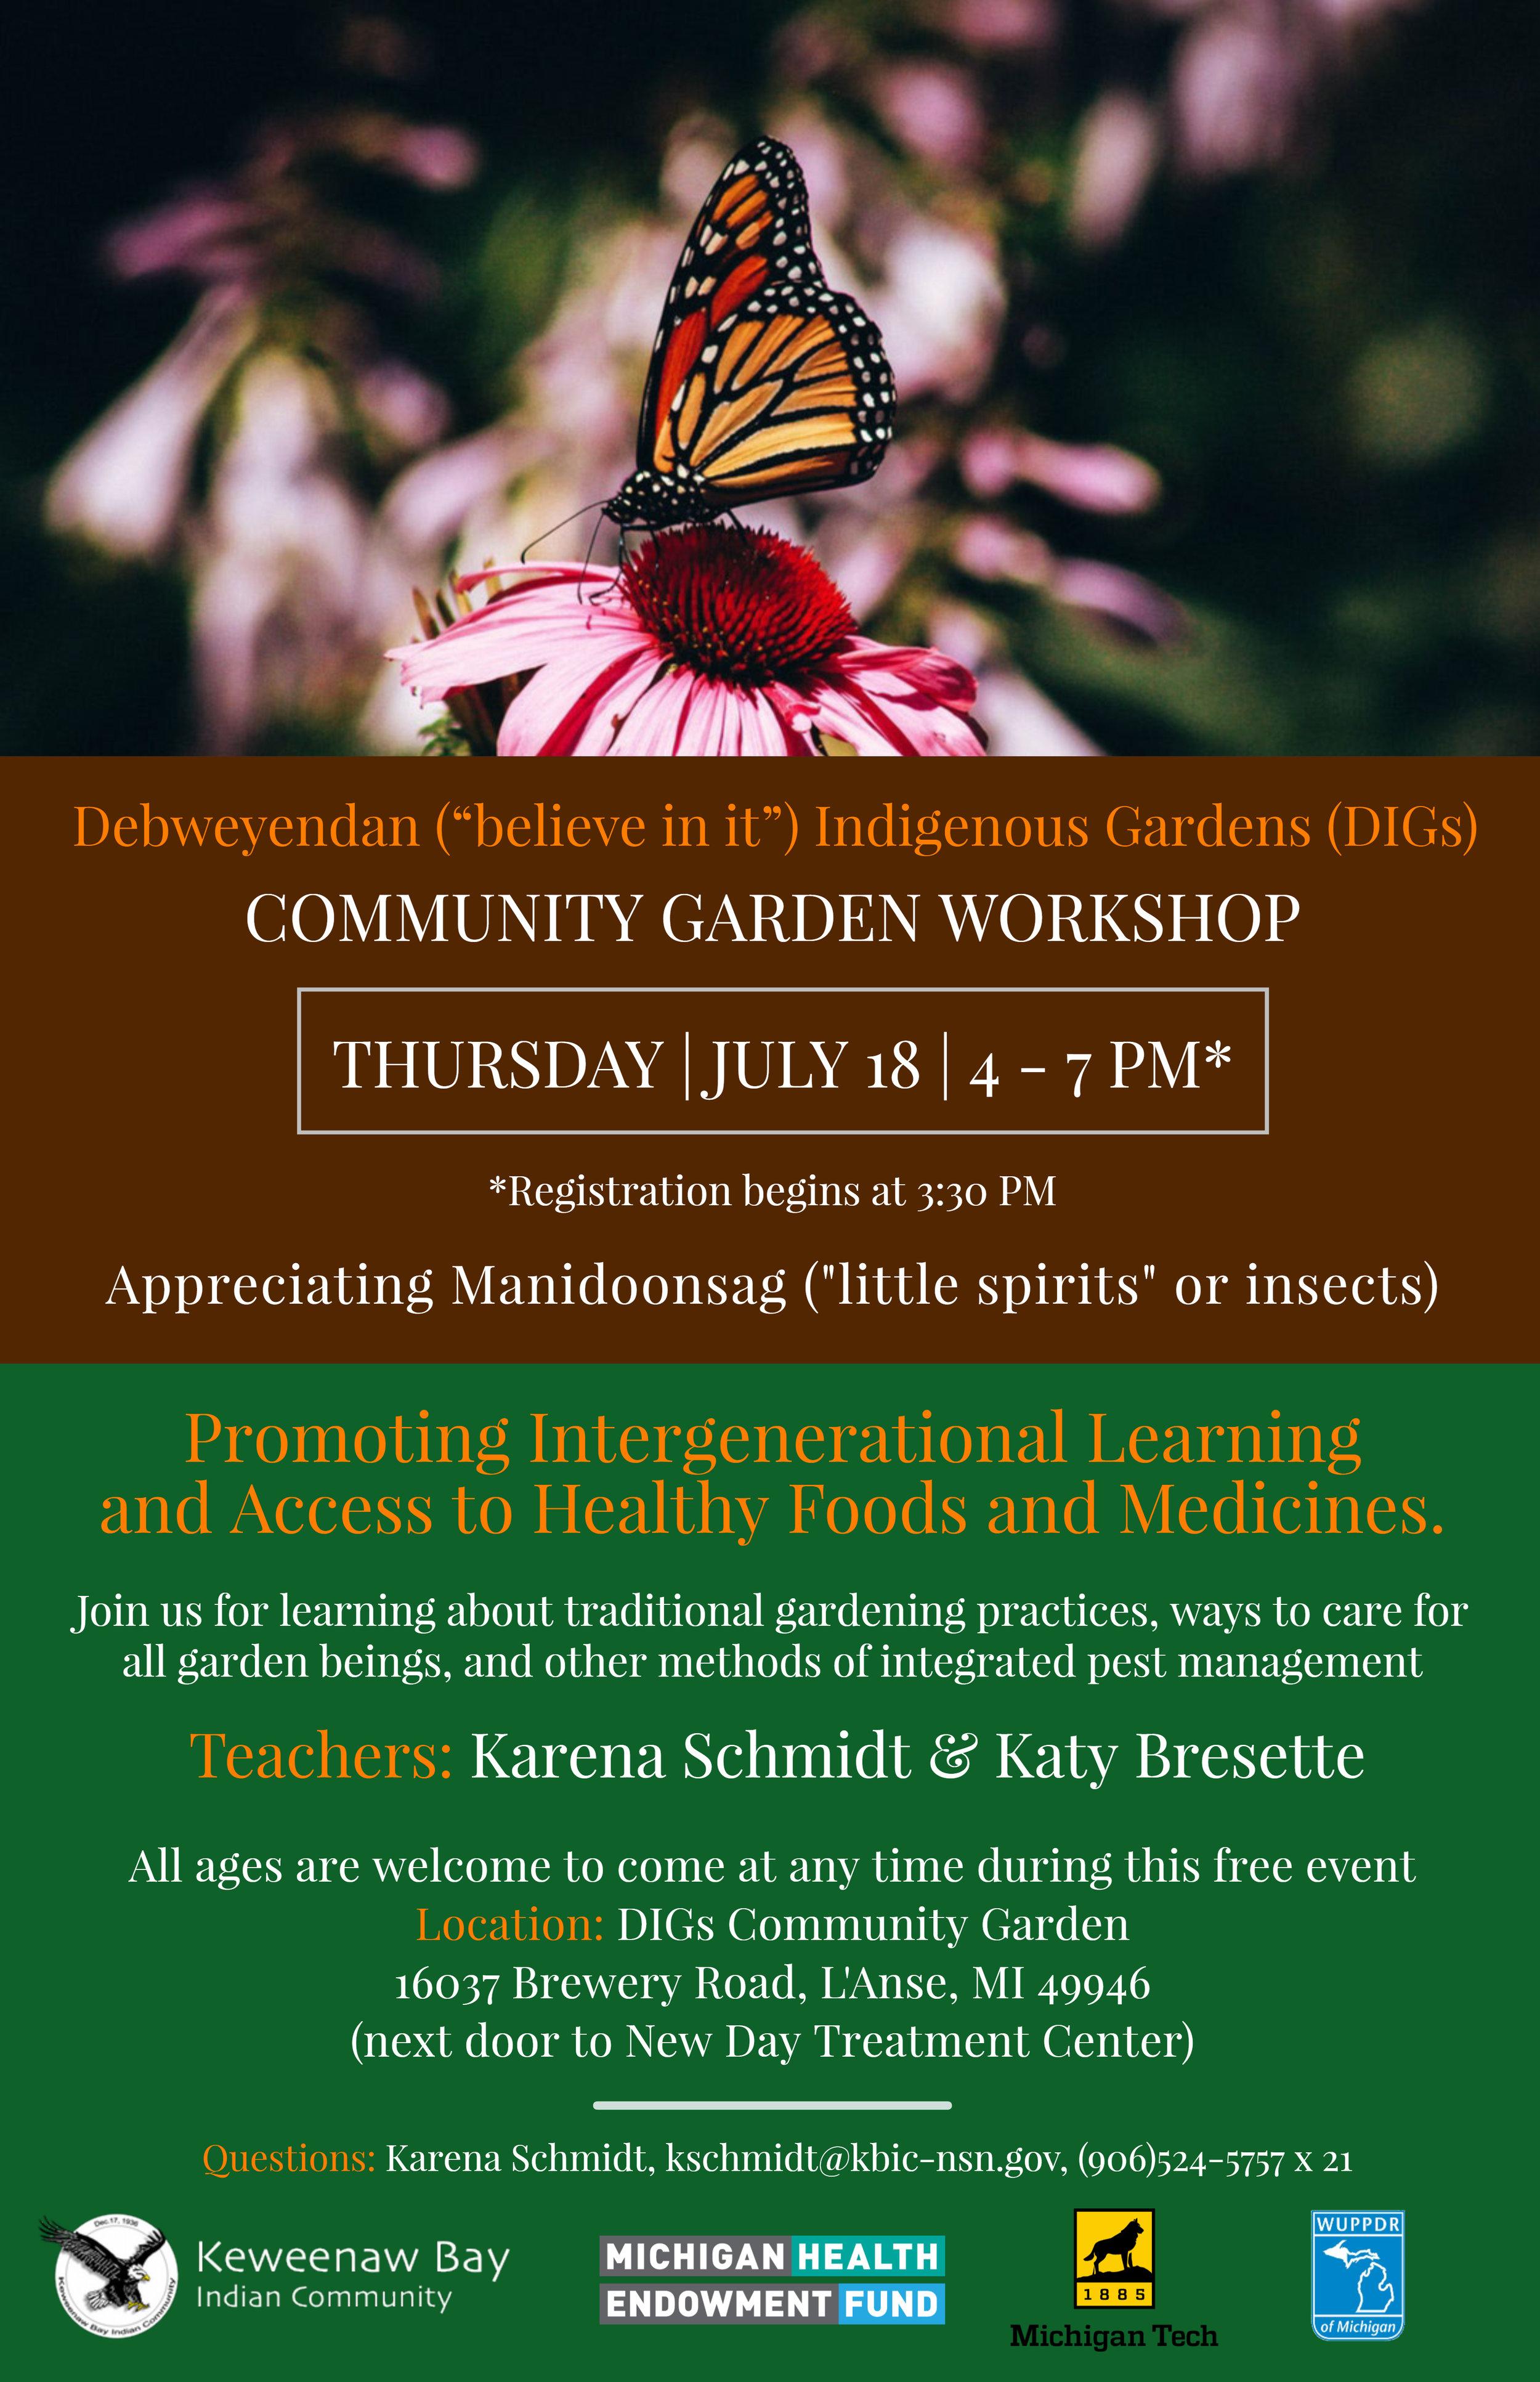 Community Garden Workshop Flyer July17.jpg